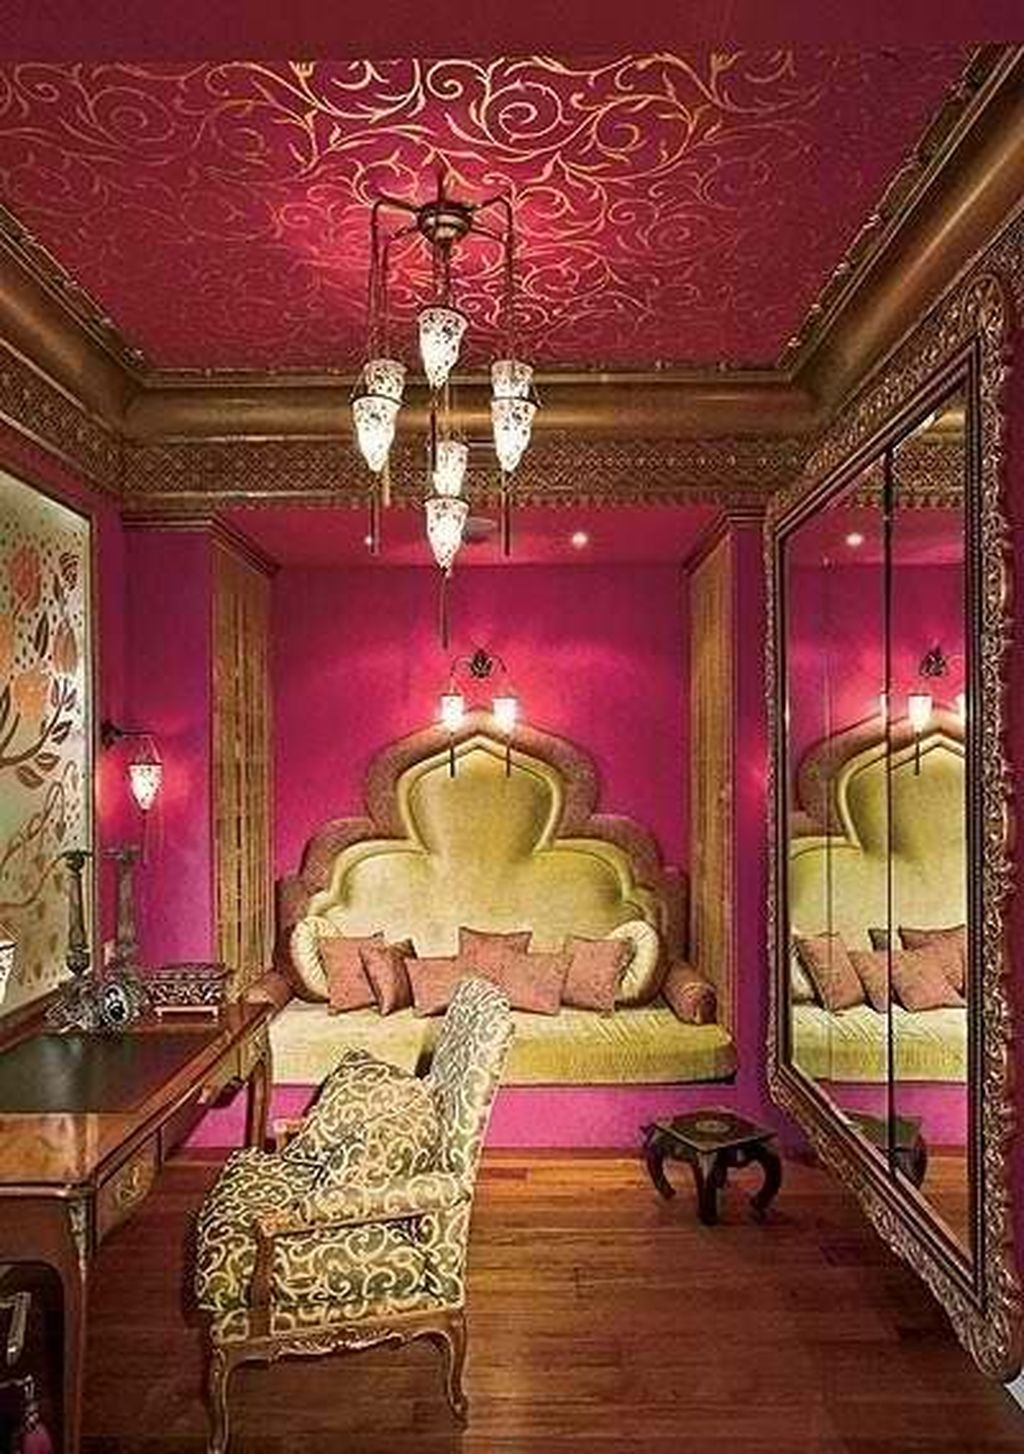 Small indian bedroom tour | small bedroom decor & organization | indian mom studio. Nice 40 Fascinating Moroccan Bedroom Decoration Ideas